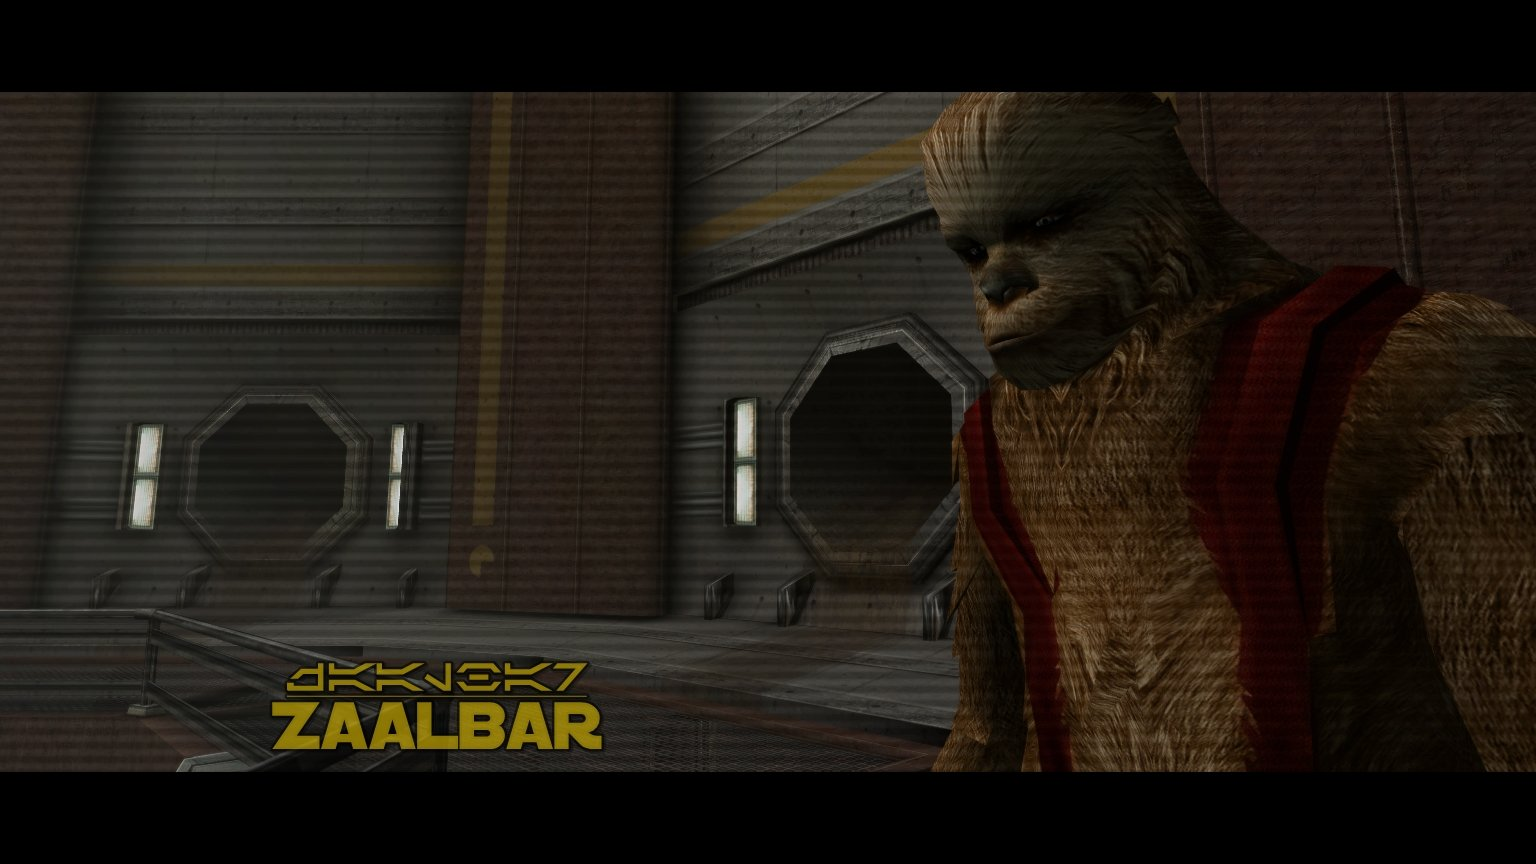 The Companions: Zaalbar